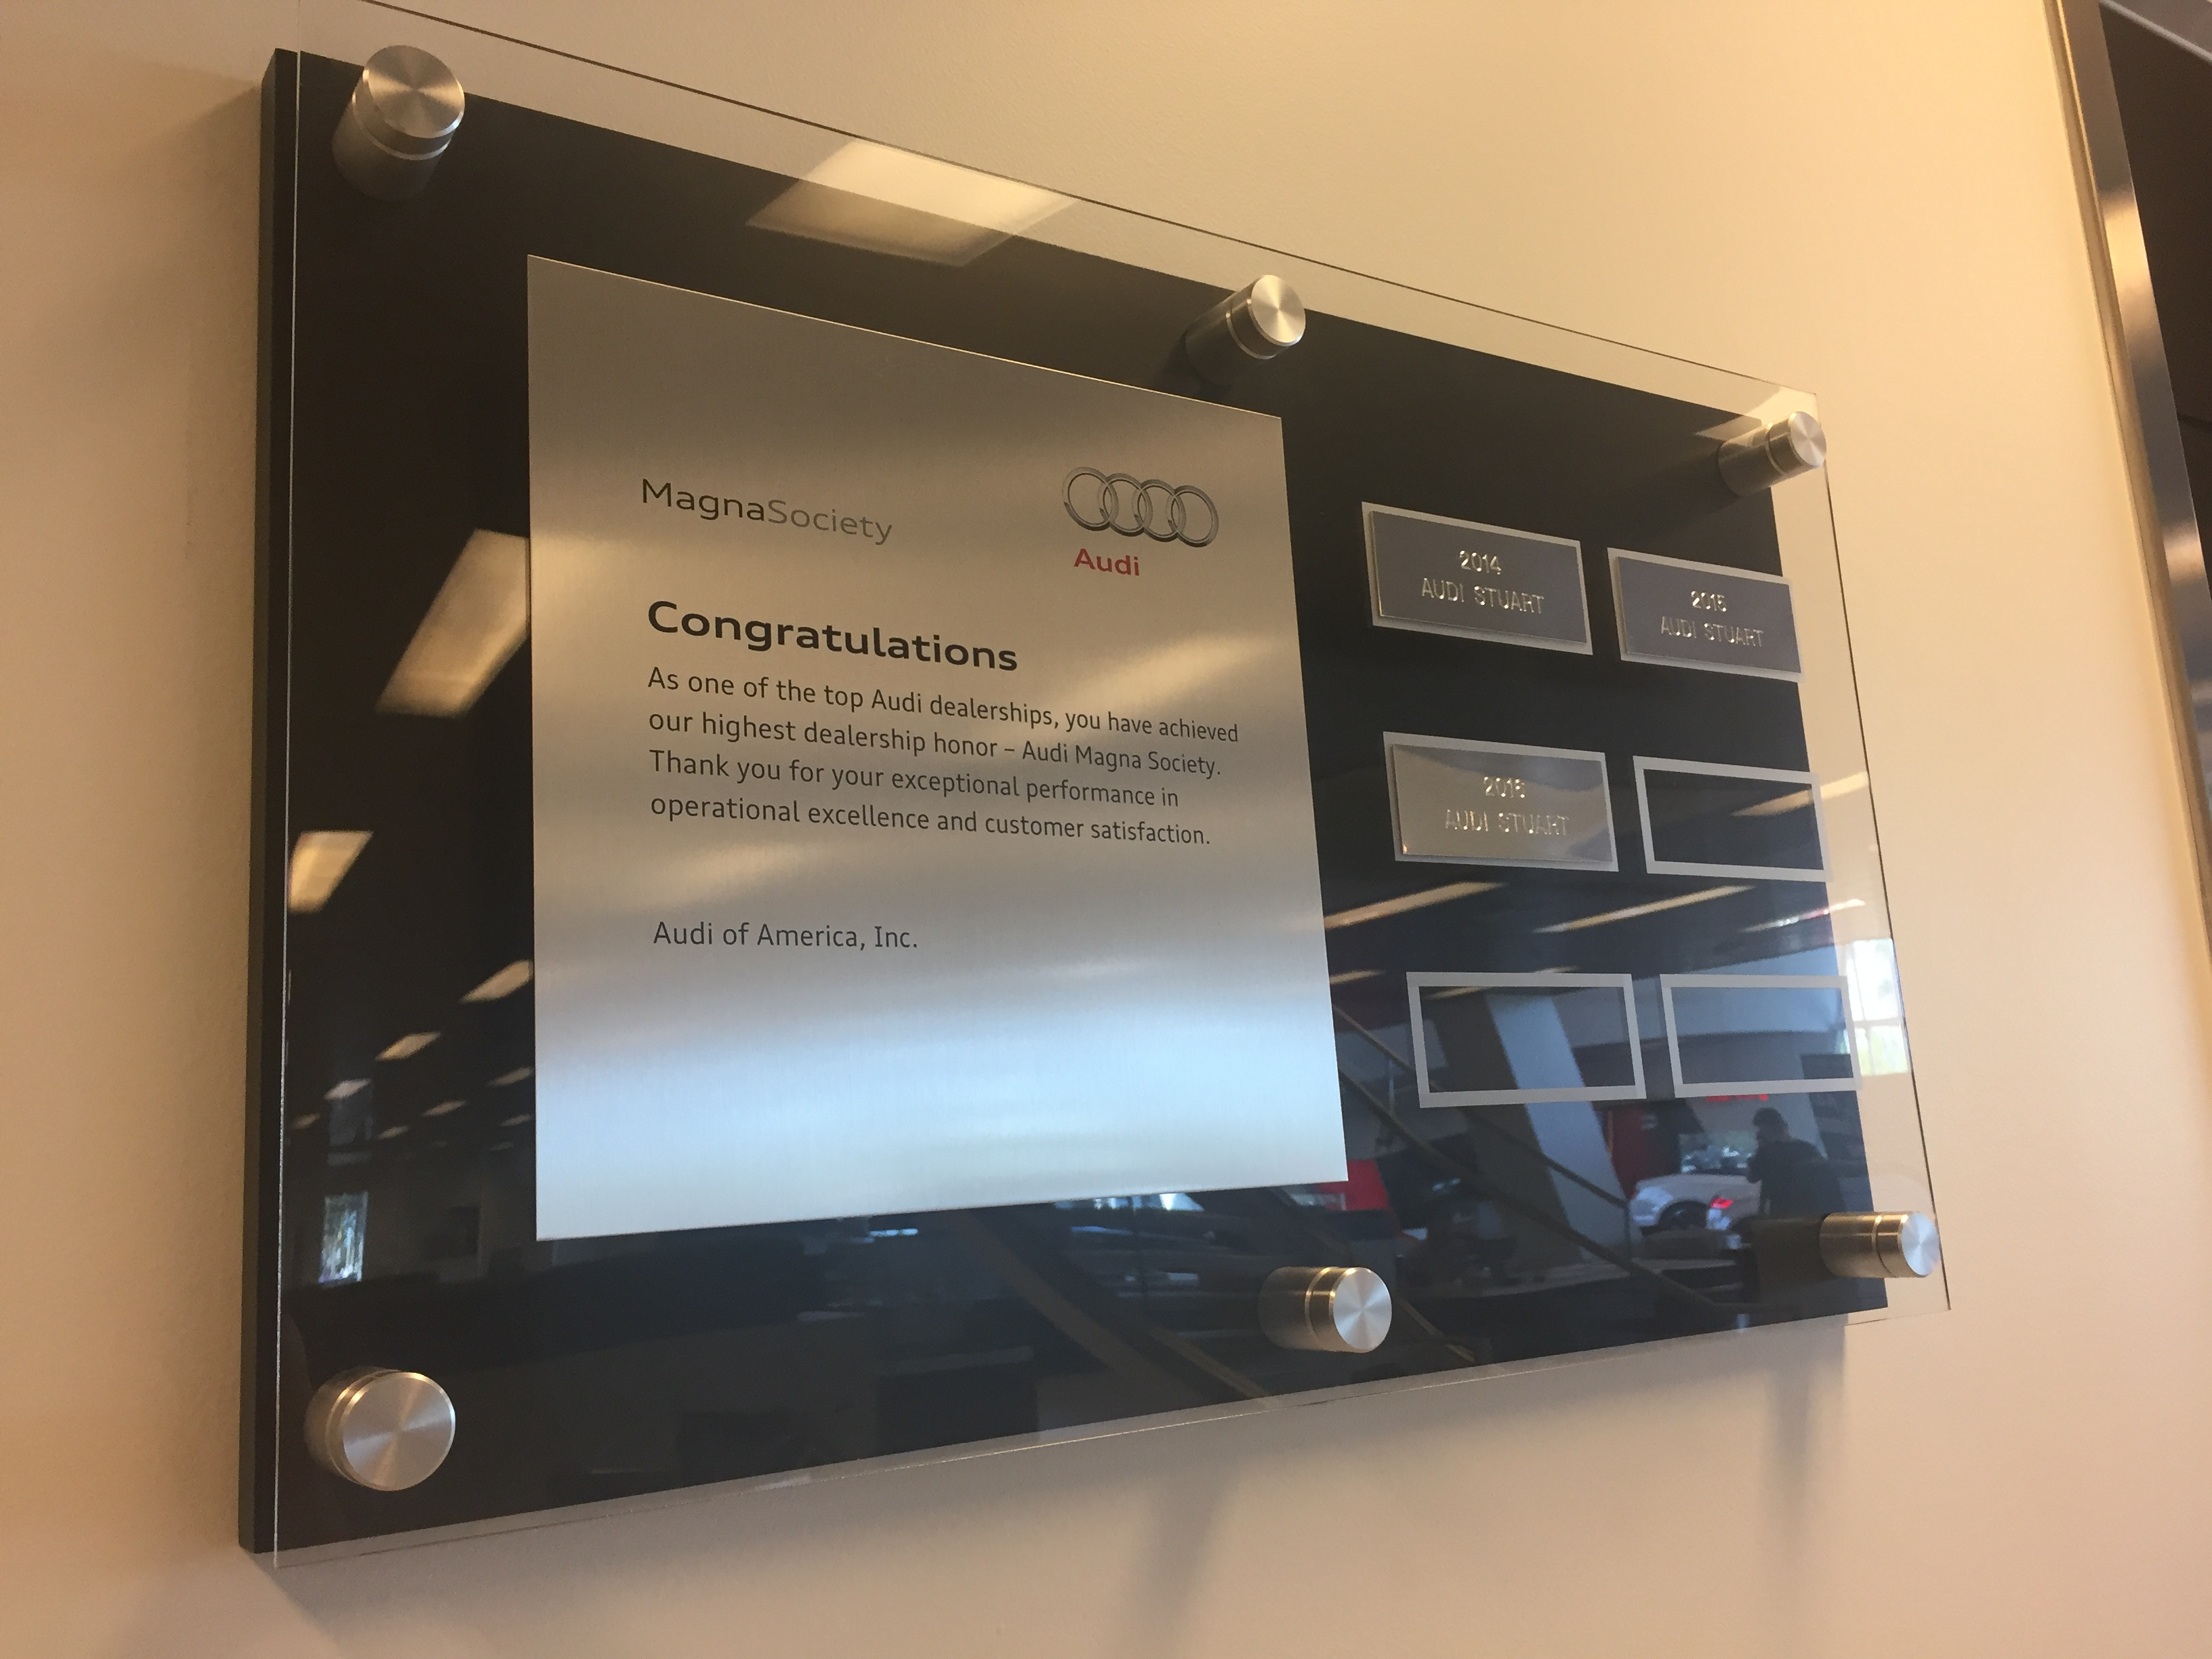 Audi Stuart SE Federal Highway Stuart FL Auto Dealers MapQuest - Audi stuart